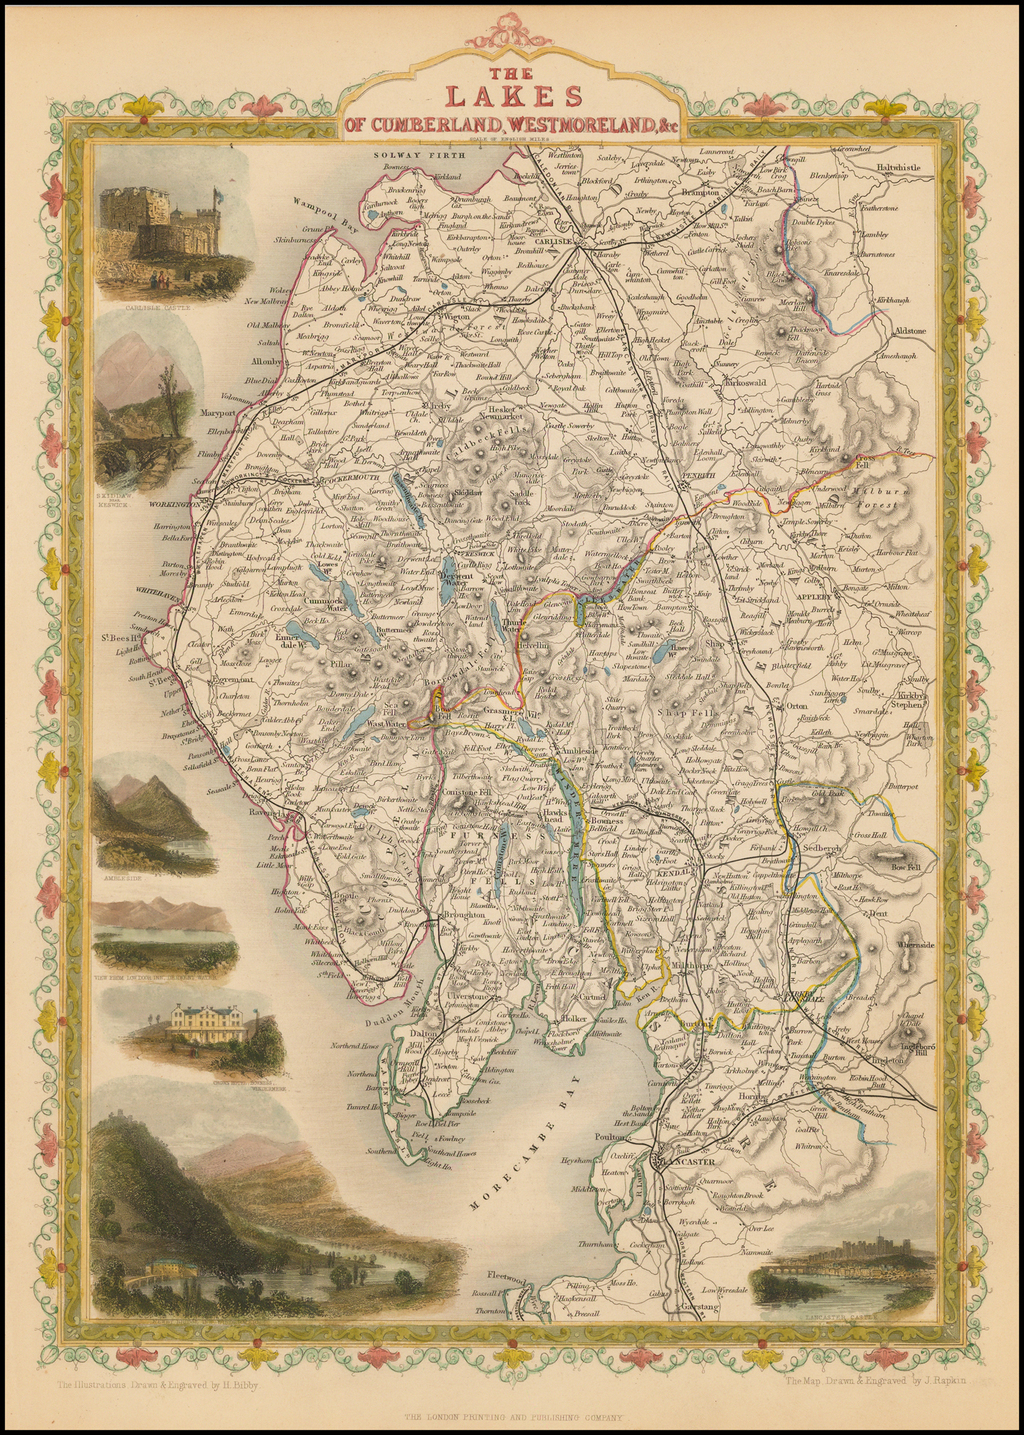 The Lakes, of Cumberland, Westmoreland, &c. By John Tallis